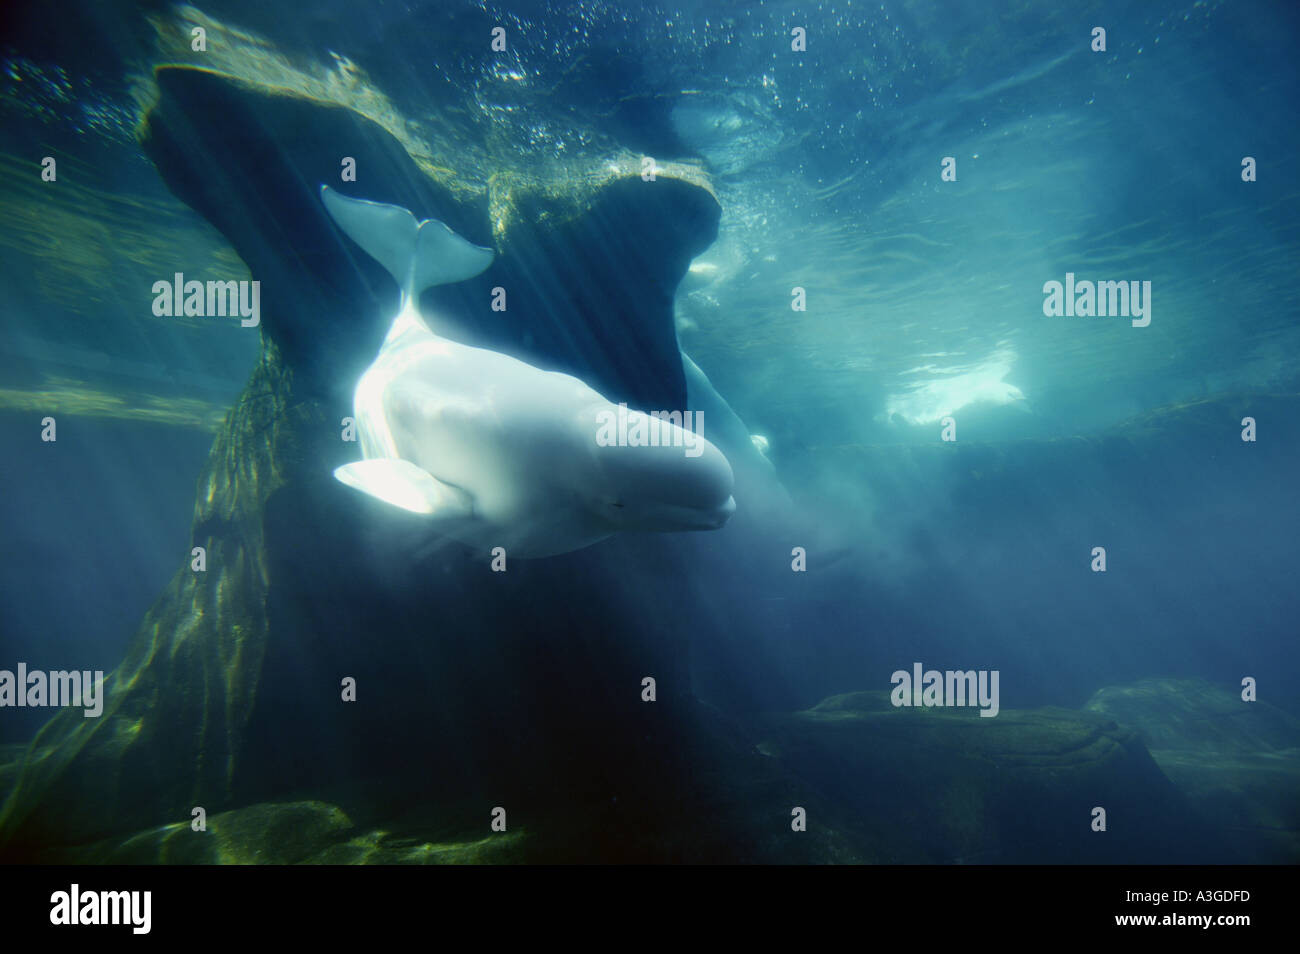 La vida submarina Imagen De Stock